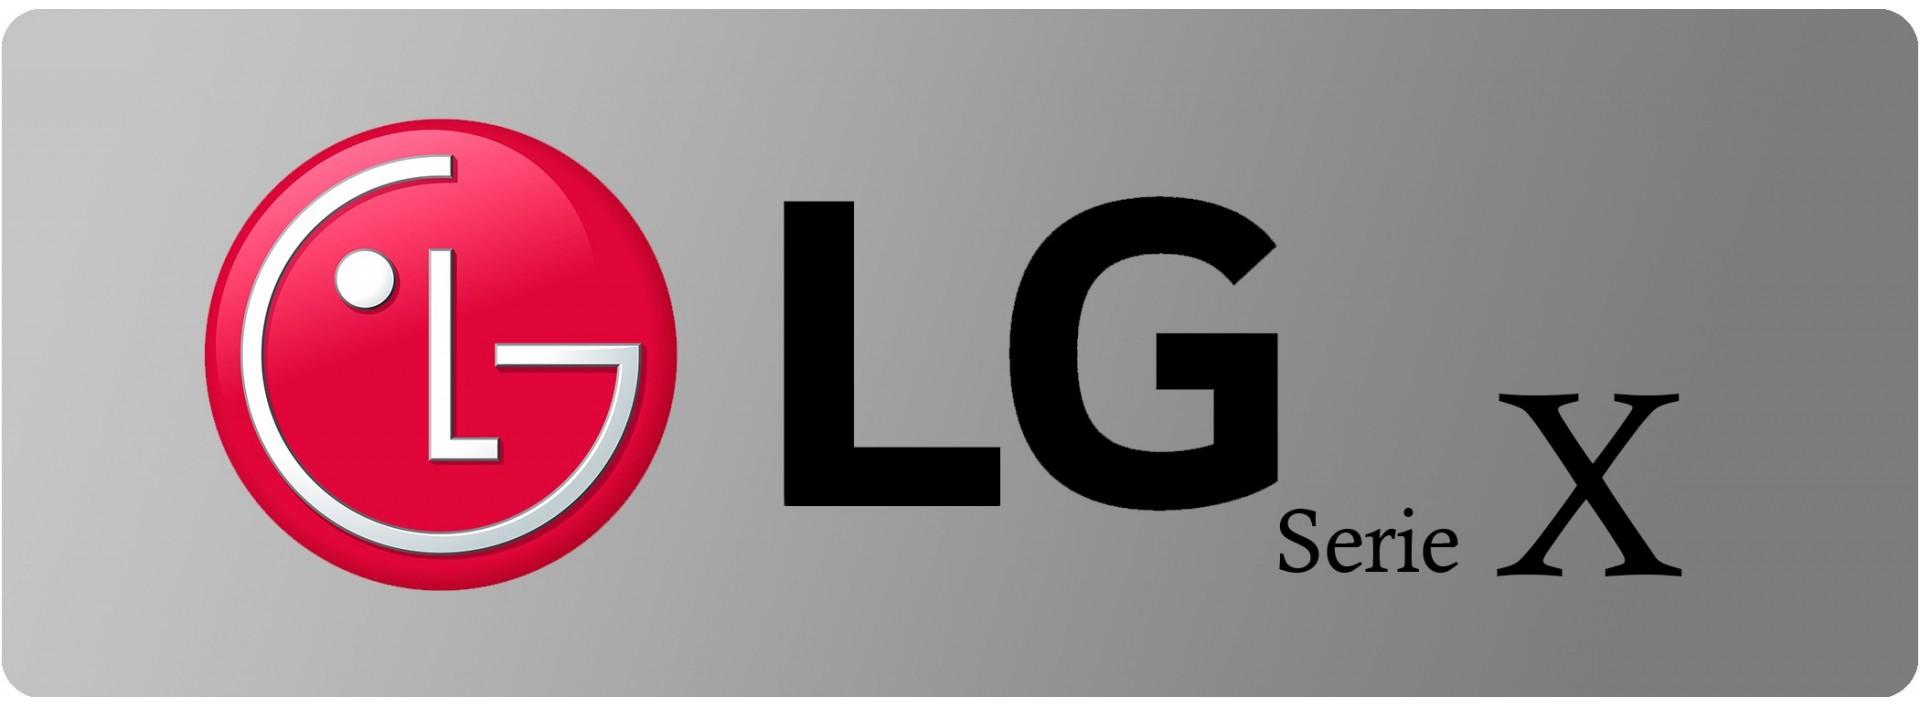 Fundas para LG Serie X